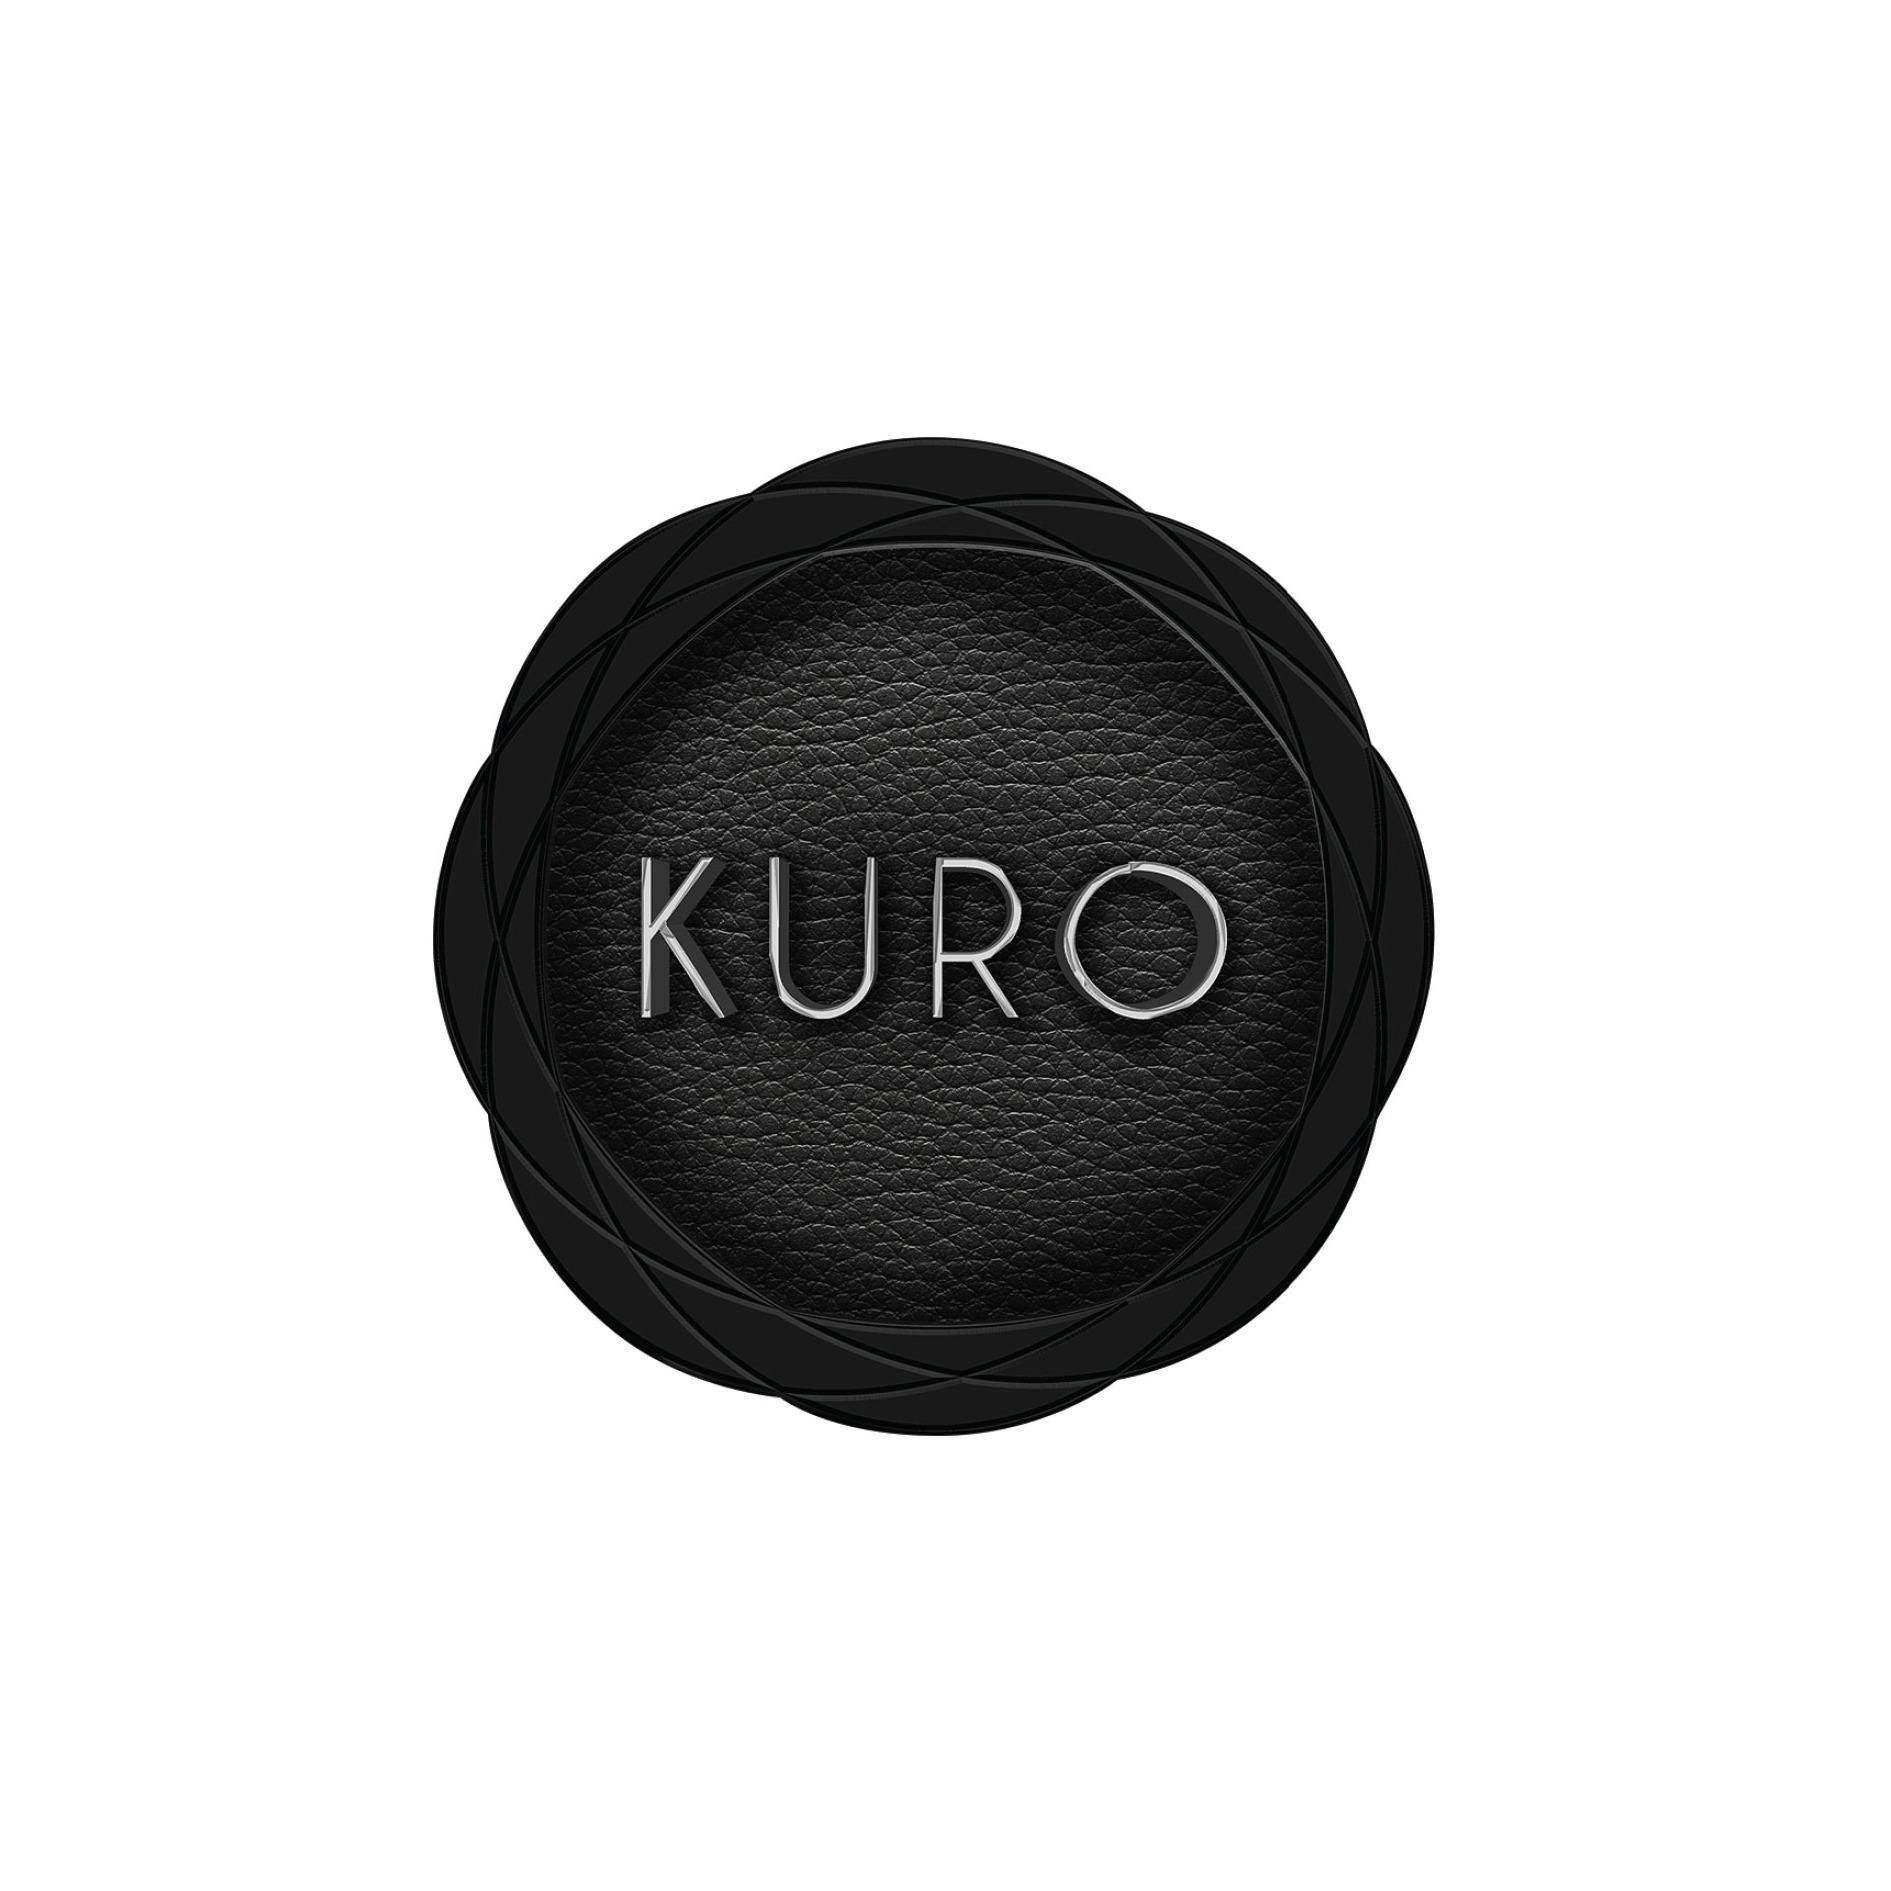 Kuro image 0